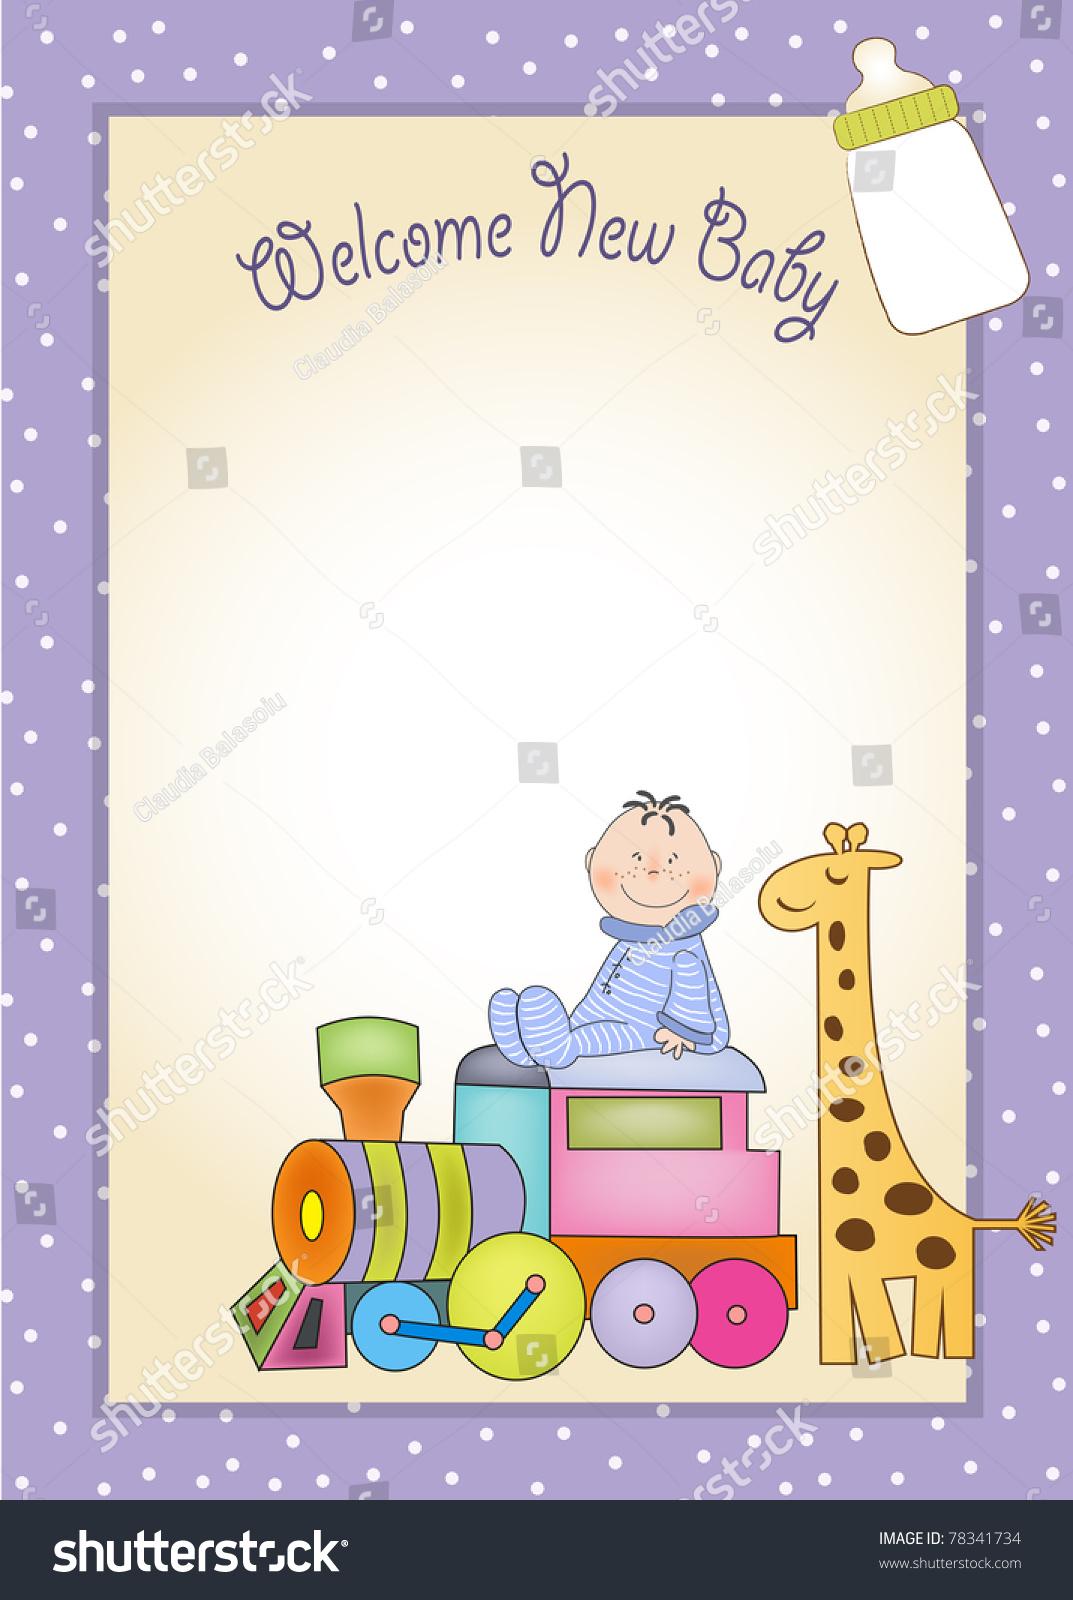 Customizable Birthday Greeting Card With Train